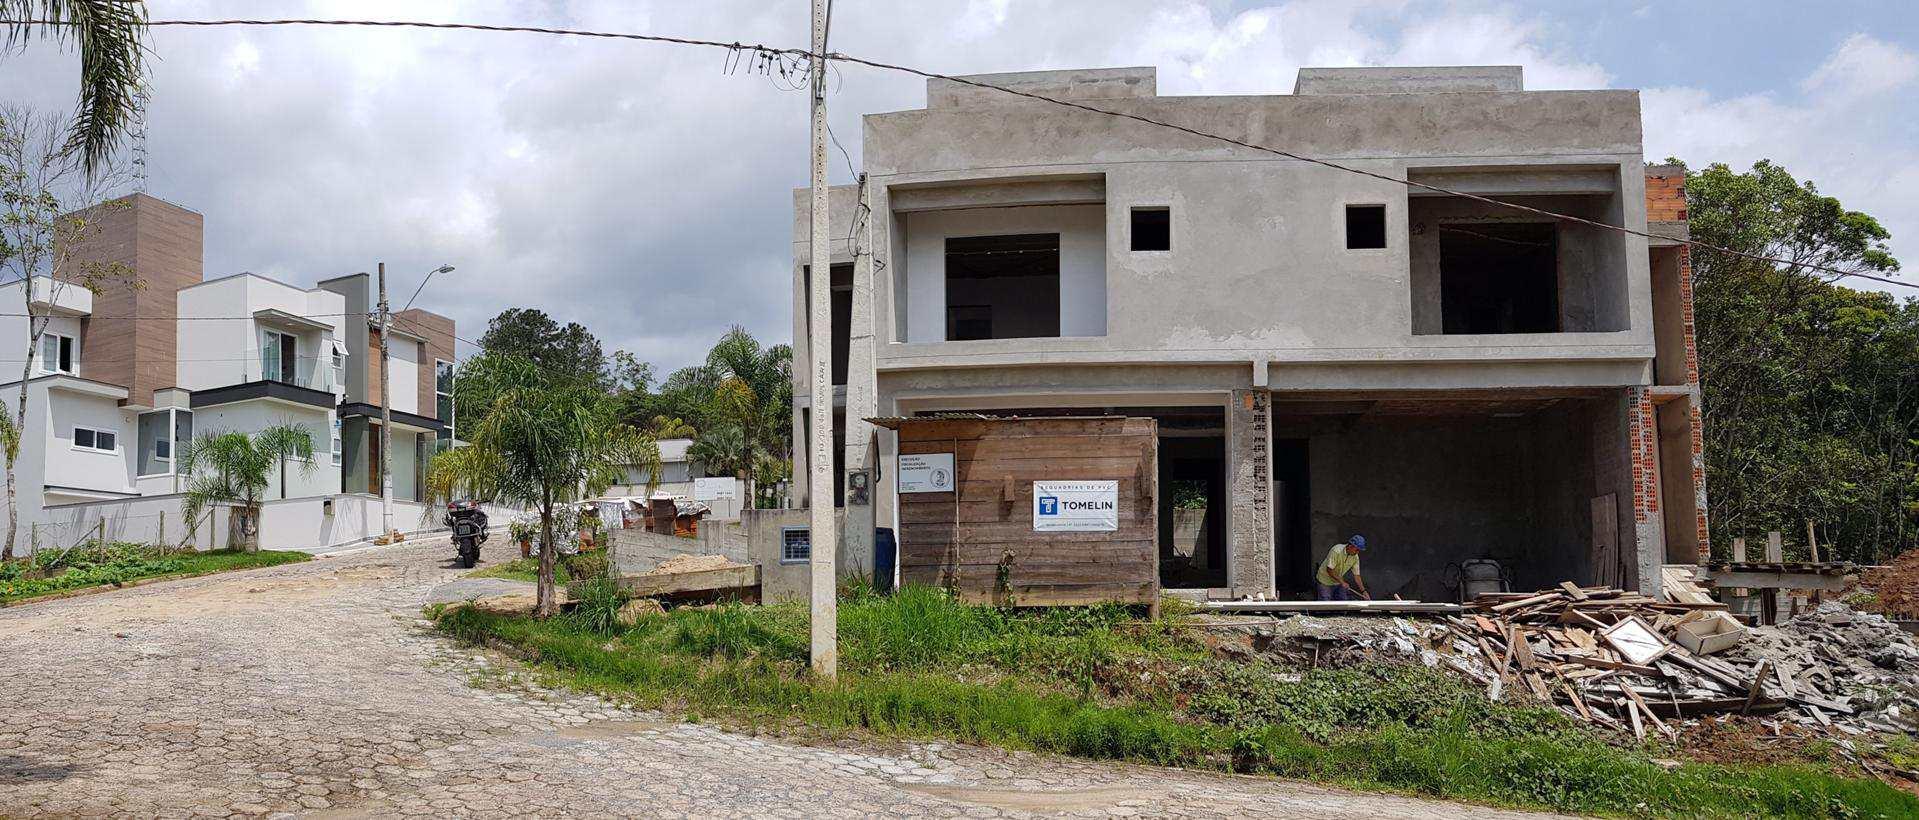 Sobrado, Ponta Aguda, Blumenau - R$ 692.000,00, 194m² - Codigo: 18